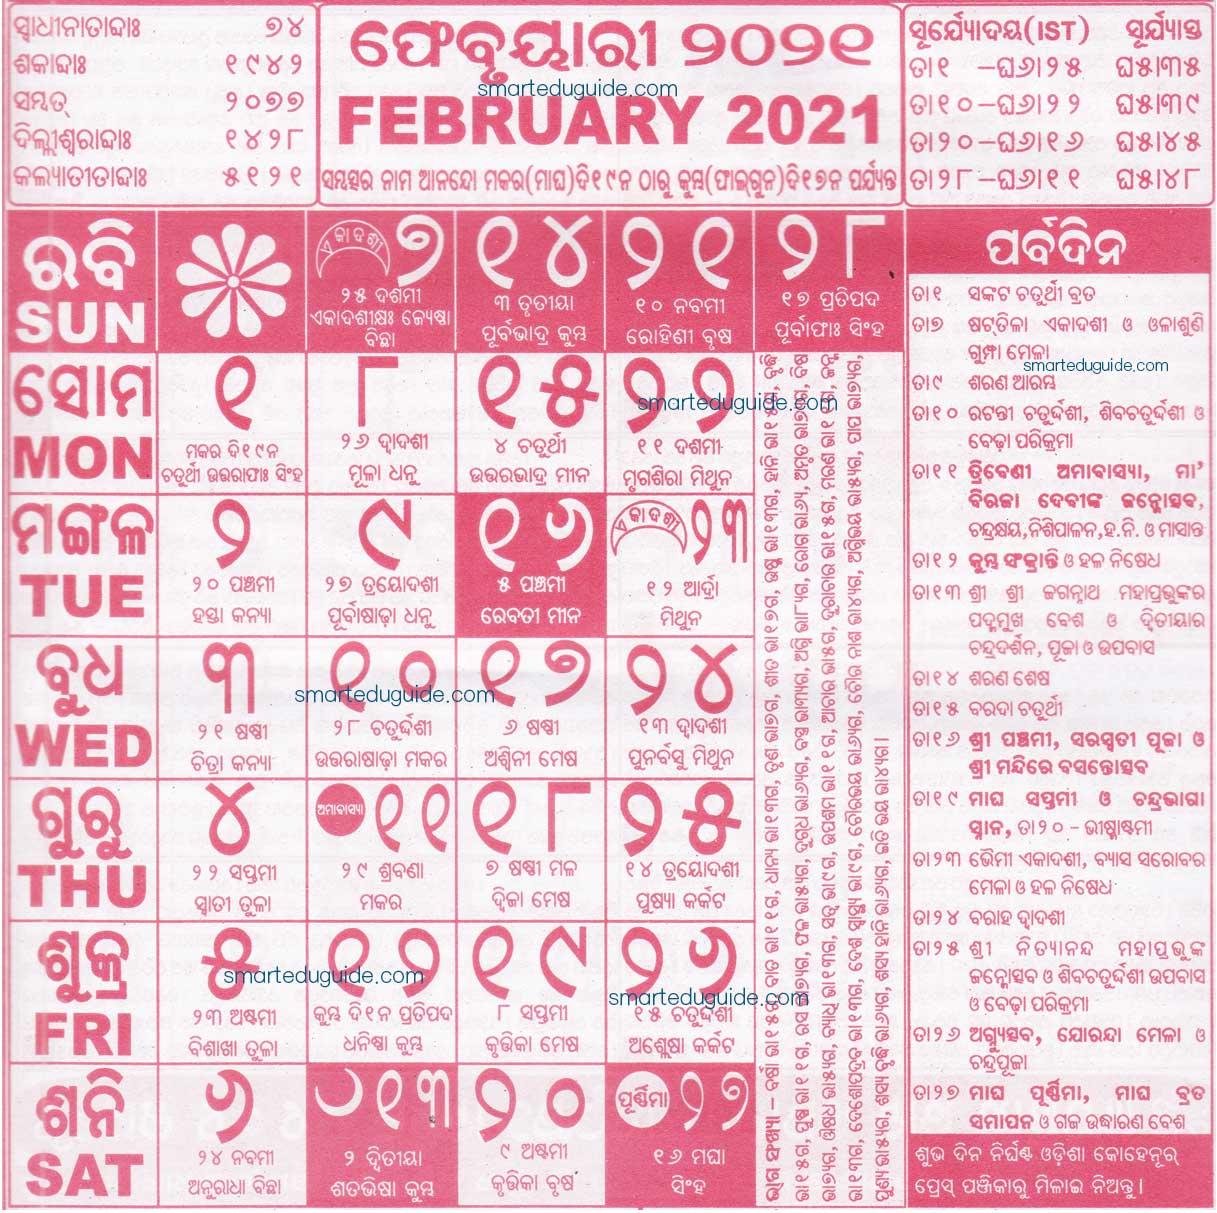 Kohinoor Odia Calendar 2021 February